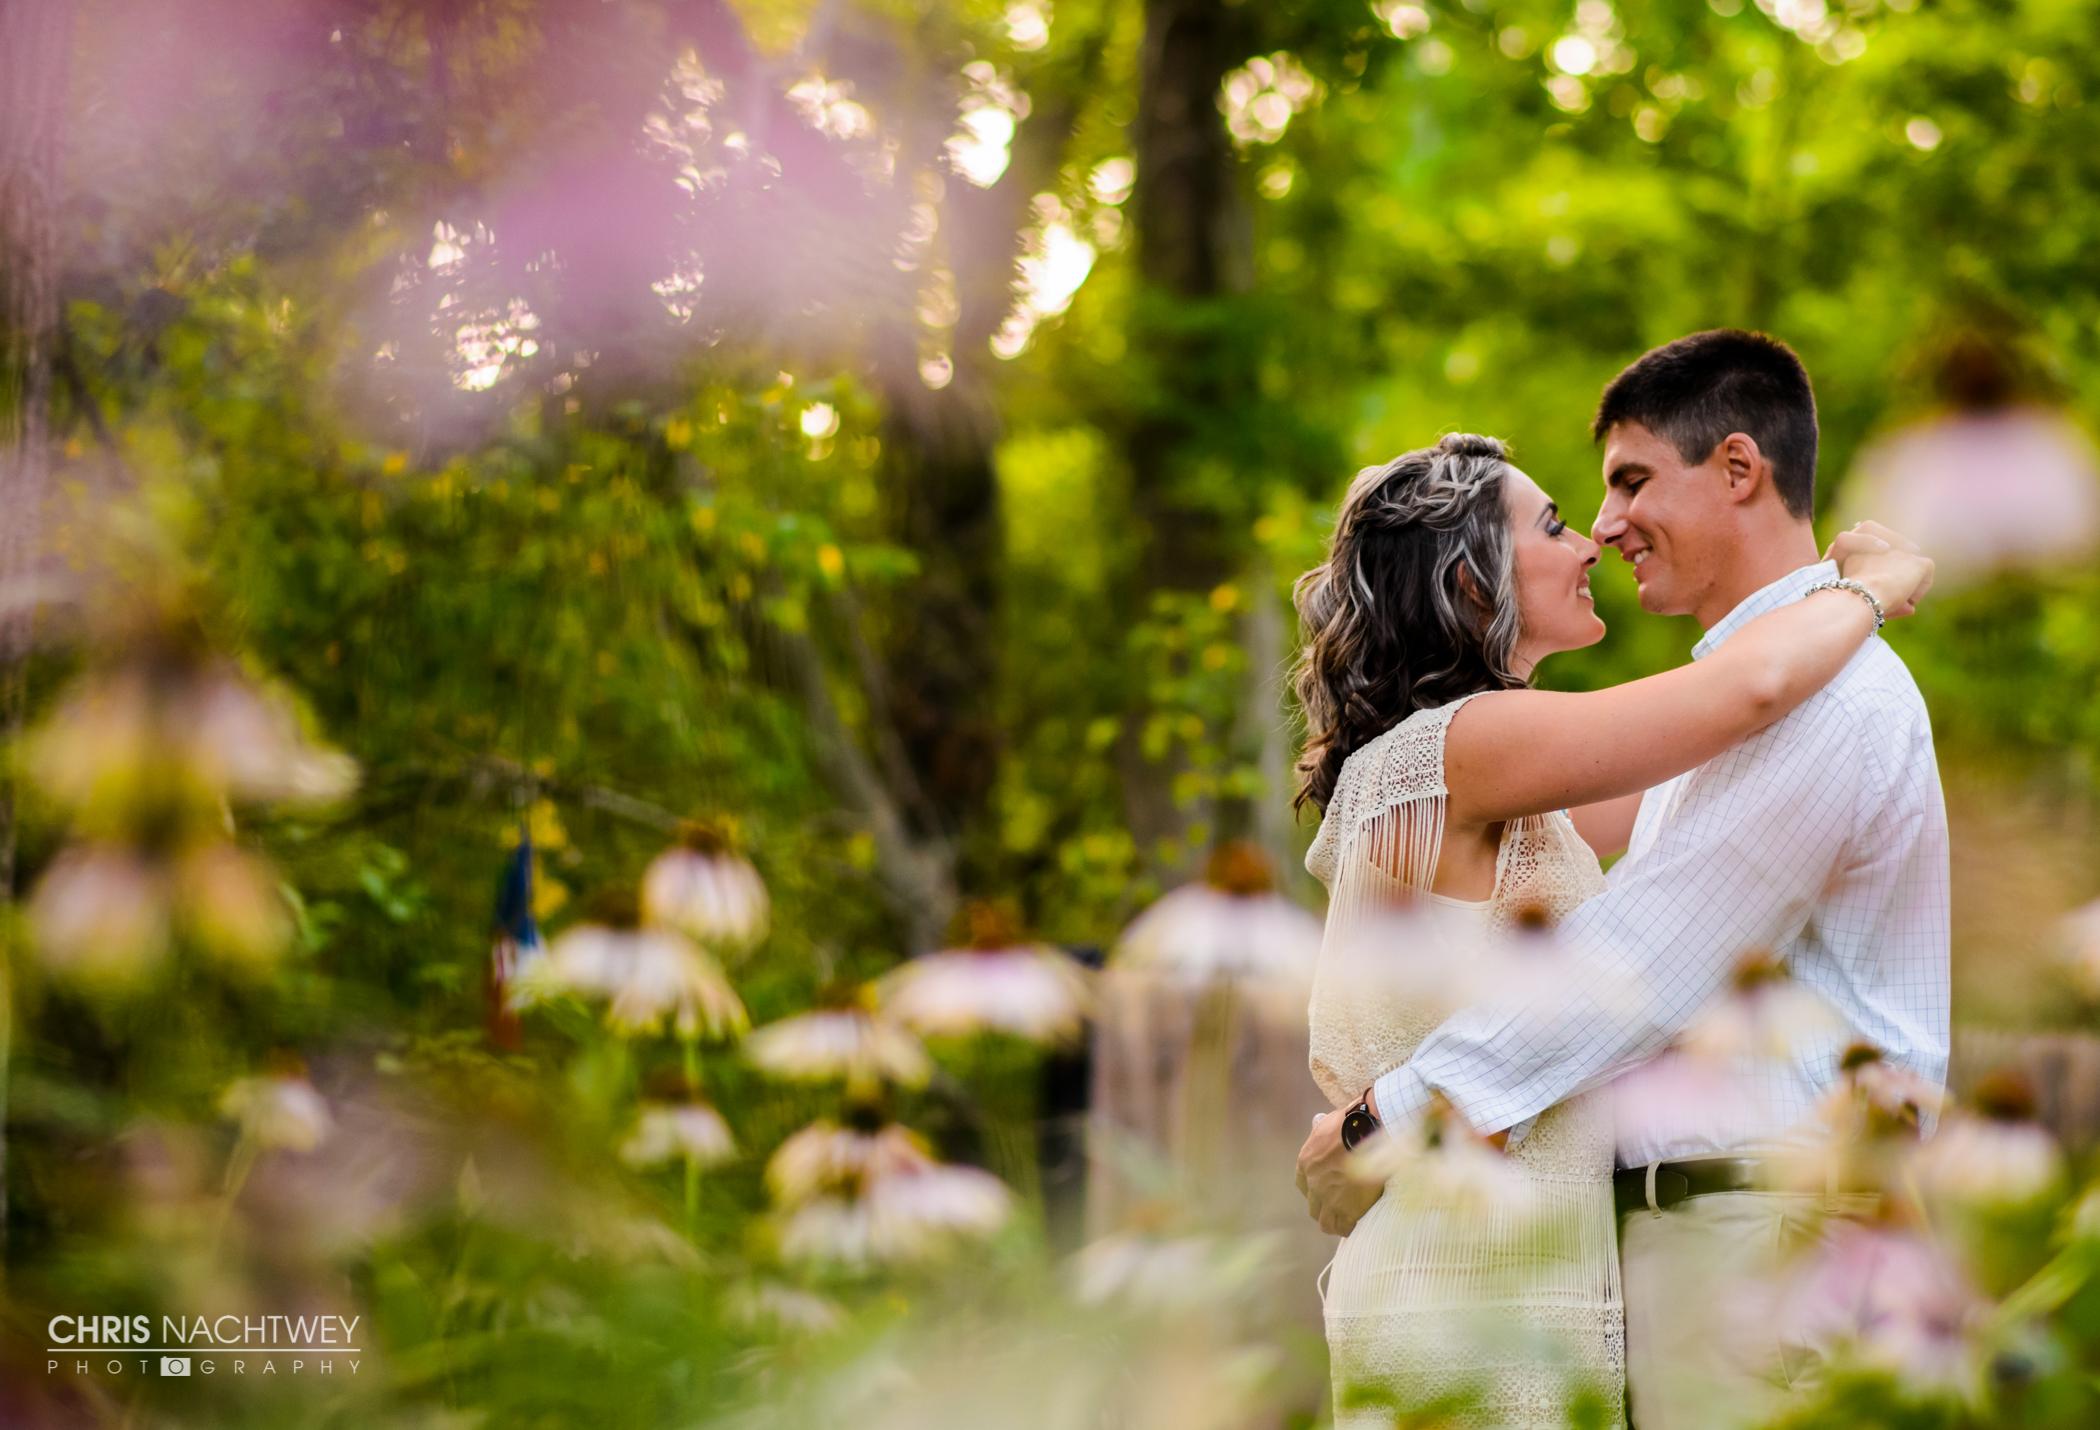 engagement-photos-the-book-barn-niantic-ct-chris-nachtwey-photography-2.jpg